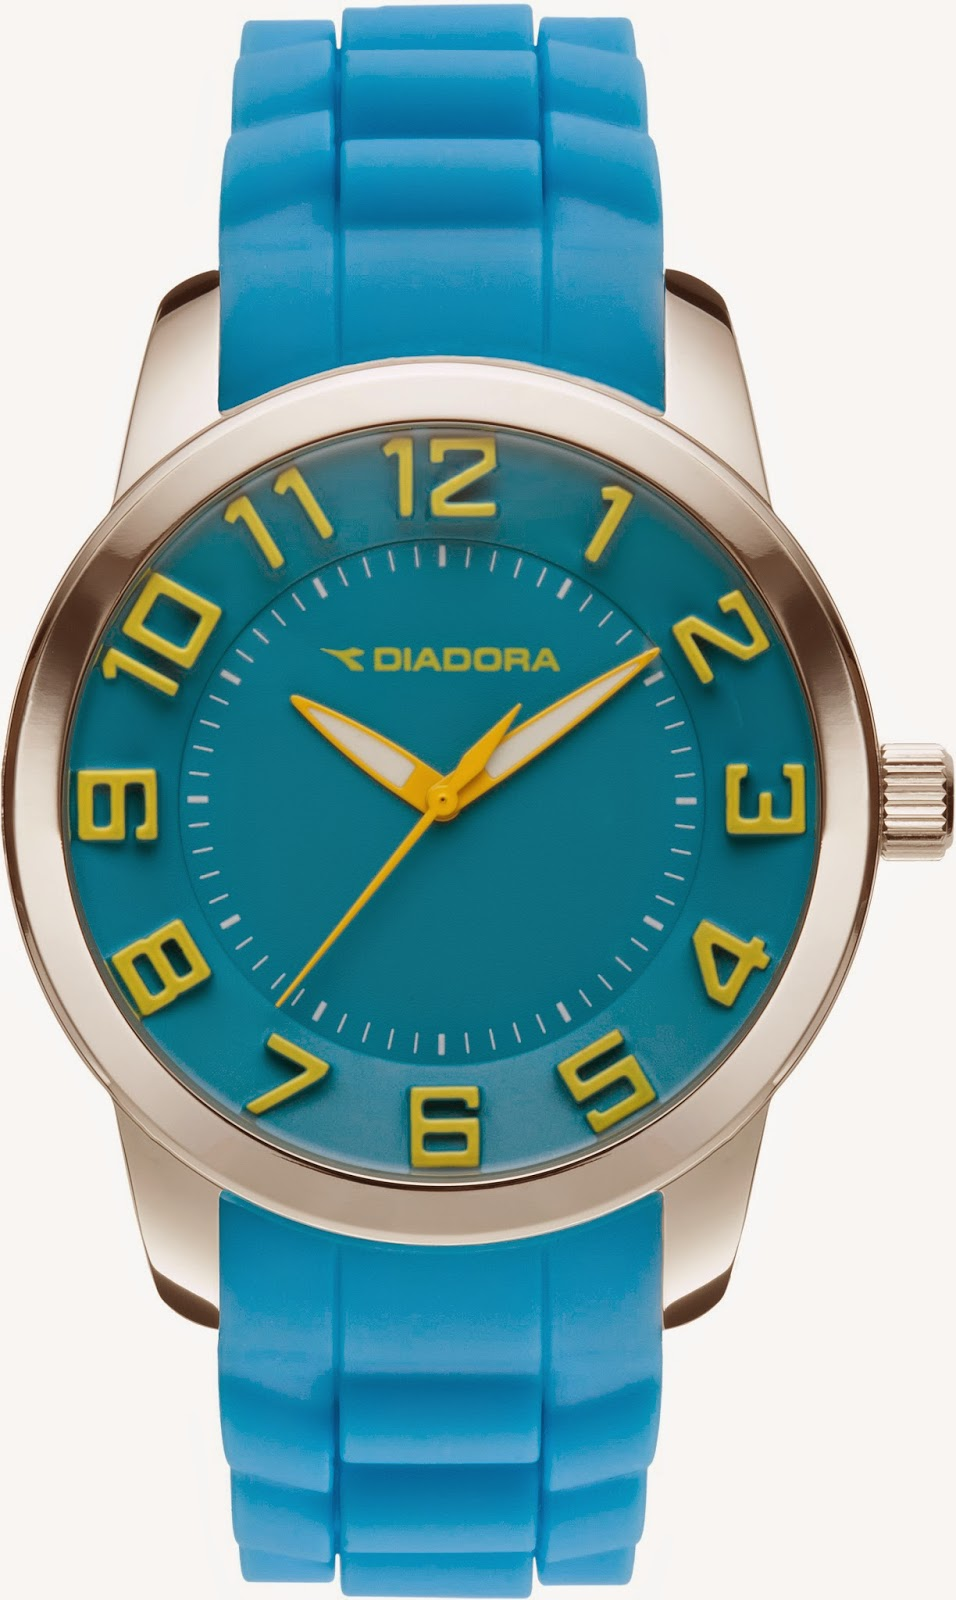 Mini Nuni Diadora Time 3d